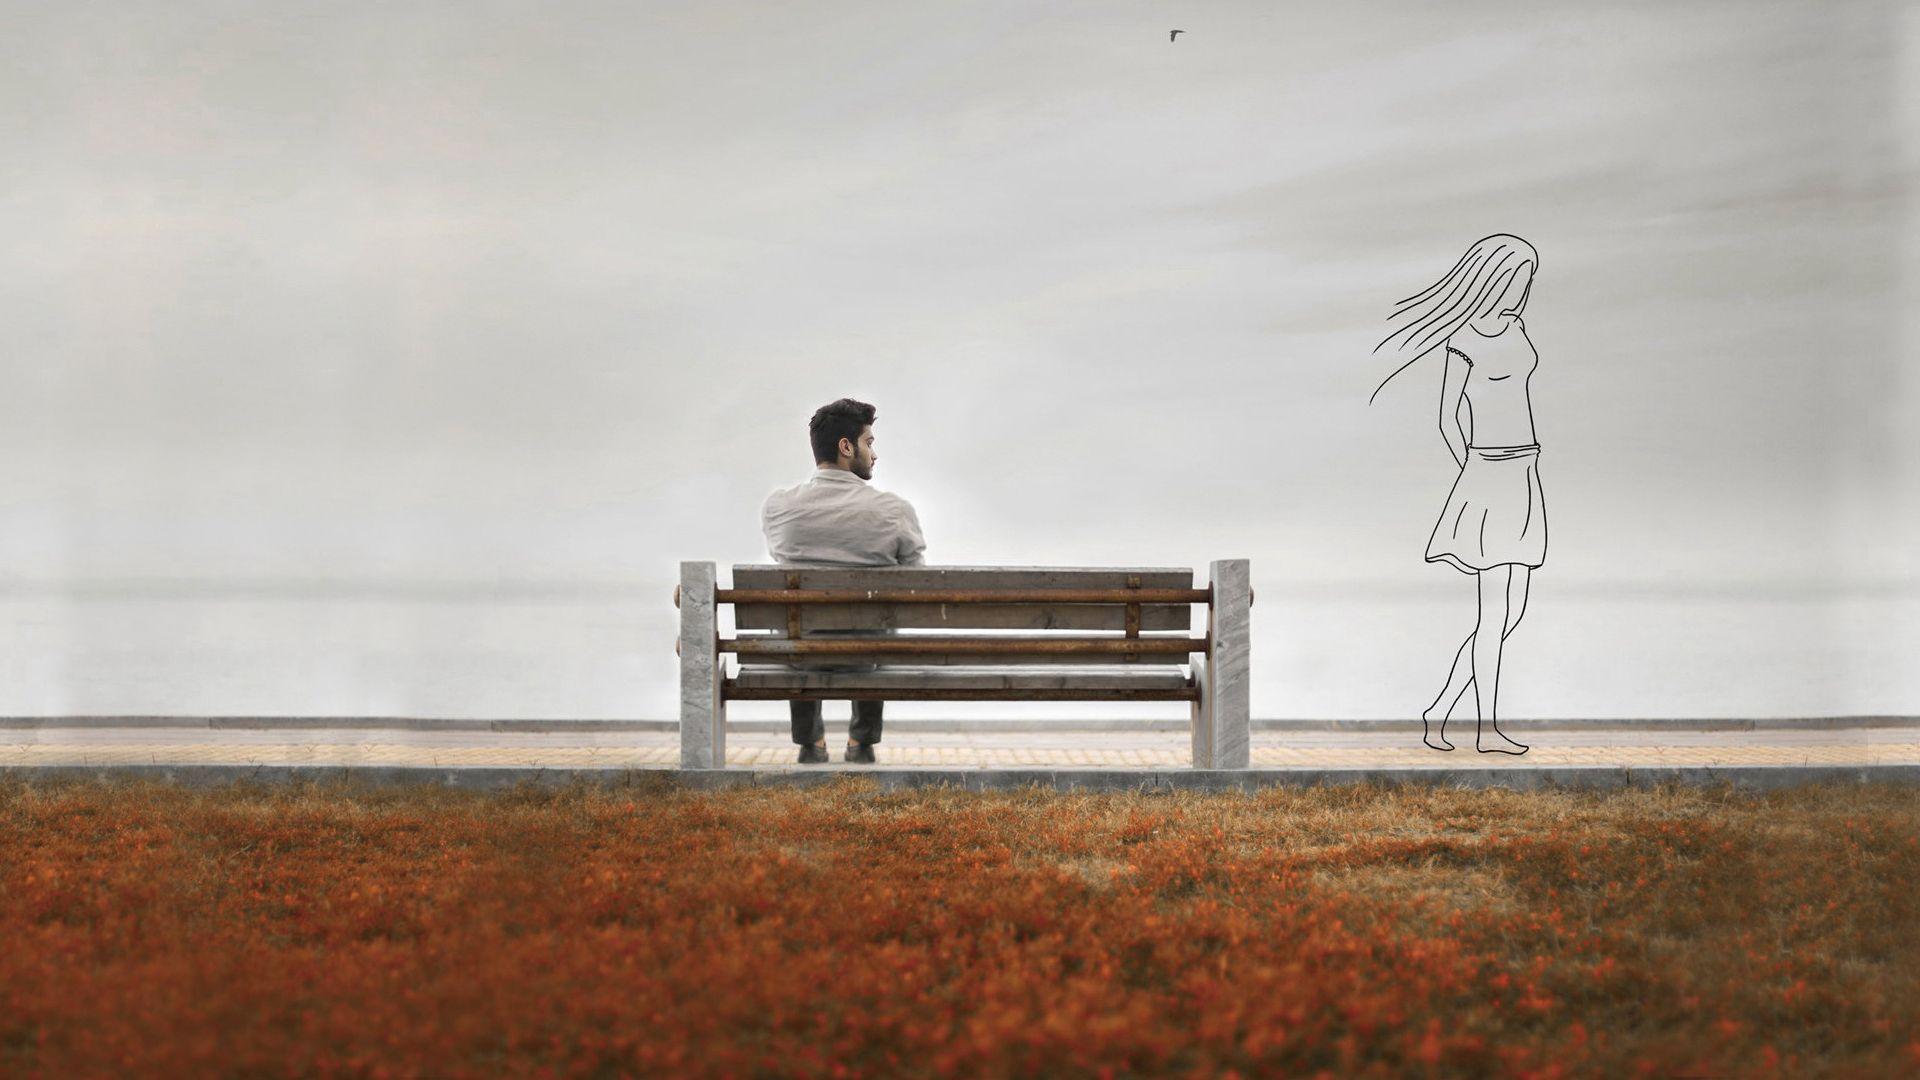 Goodfoncom Free Wallpapers, Download Girl, Memories, Silhouette, Guy